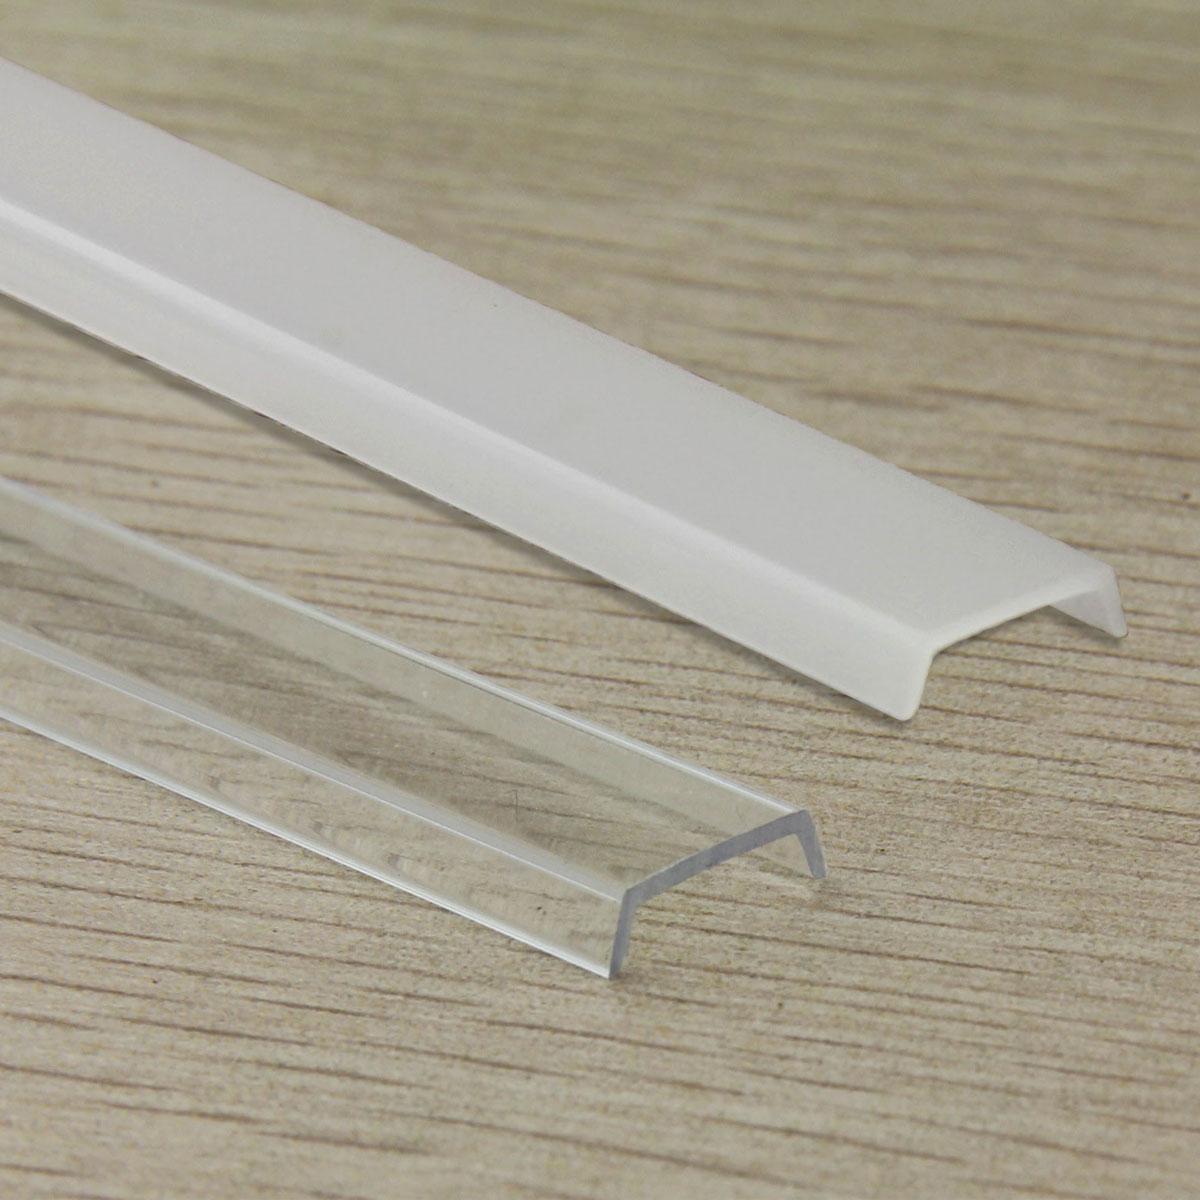 Aluminum Profile Kit-diffused